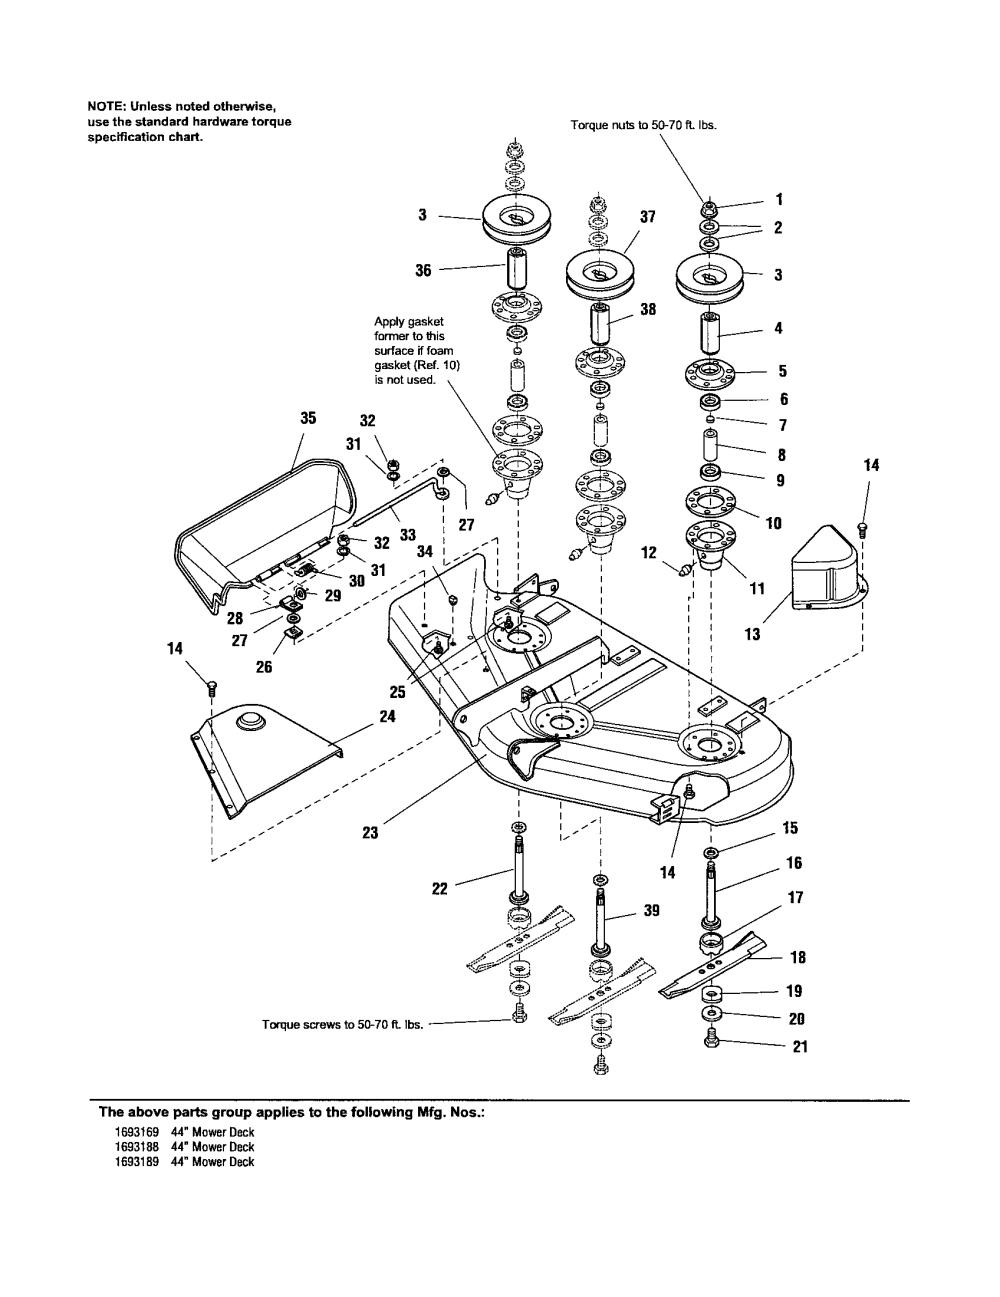 medium resolution of simplicity model 1693189 mower deck genuine parts rh searspartsdirect com simplicity riding lawn mower parts simplicity riding mower belt diagram